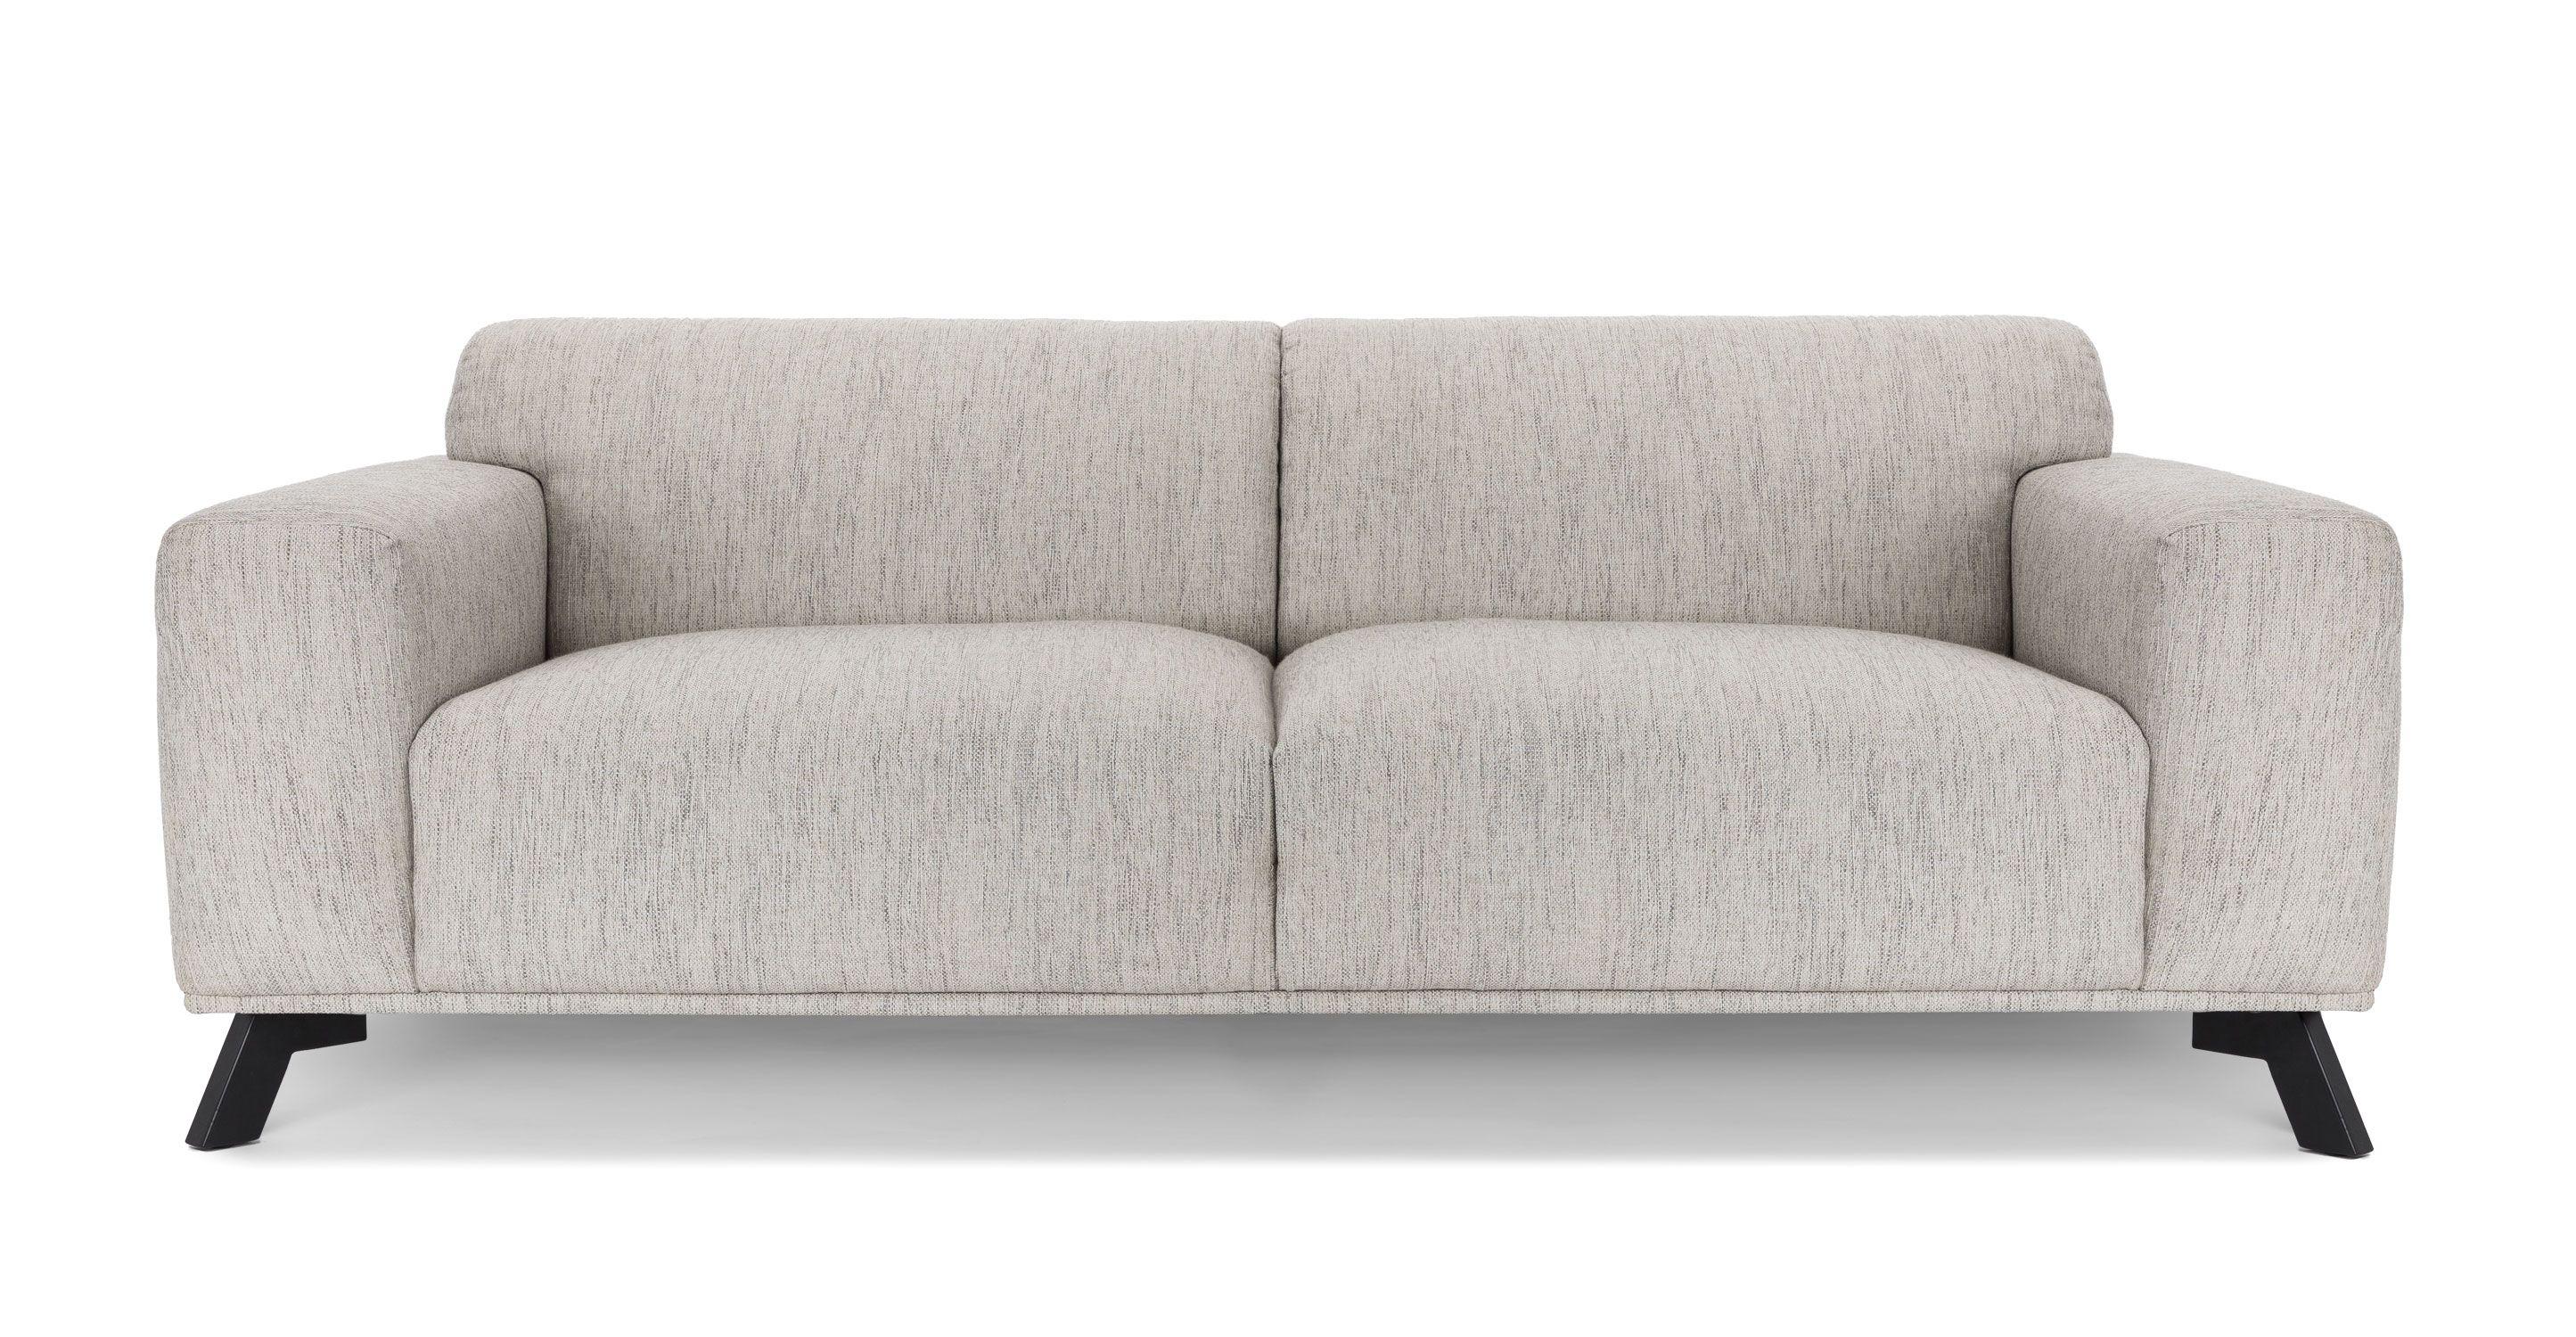 Volu Vanilla Cream Sofa Sofas Article Modern Mid Century And Scandinavian Furniture